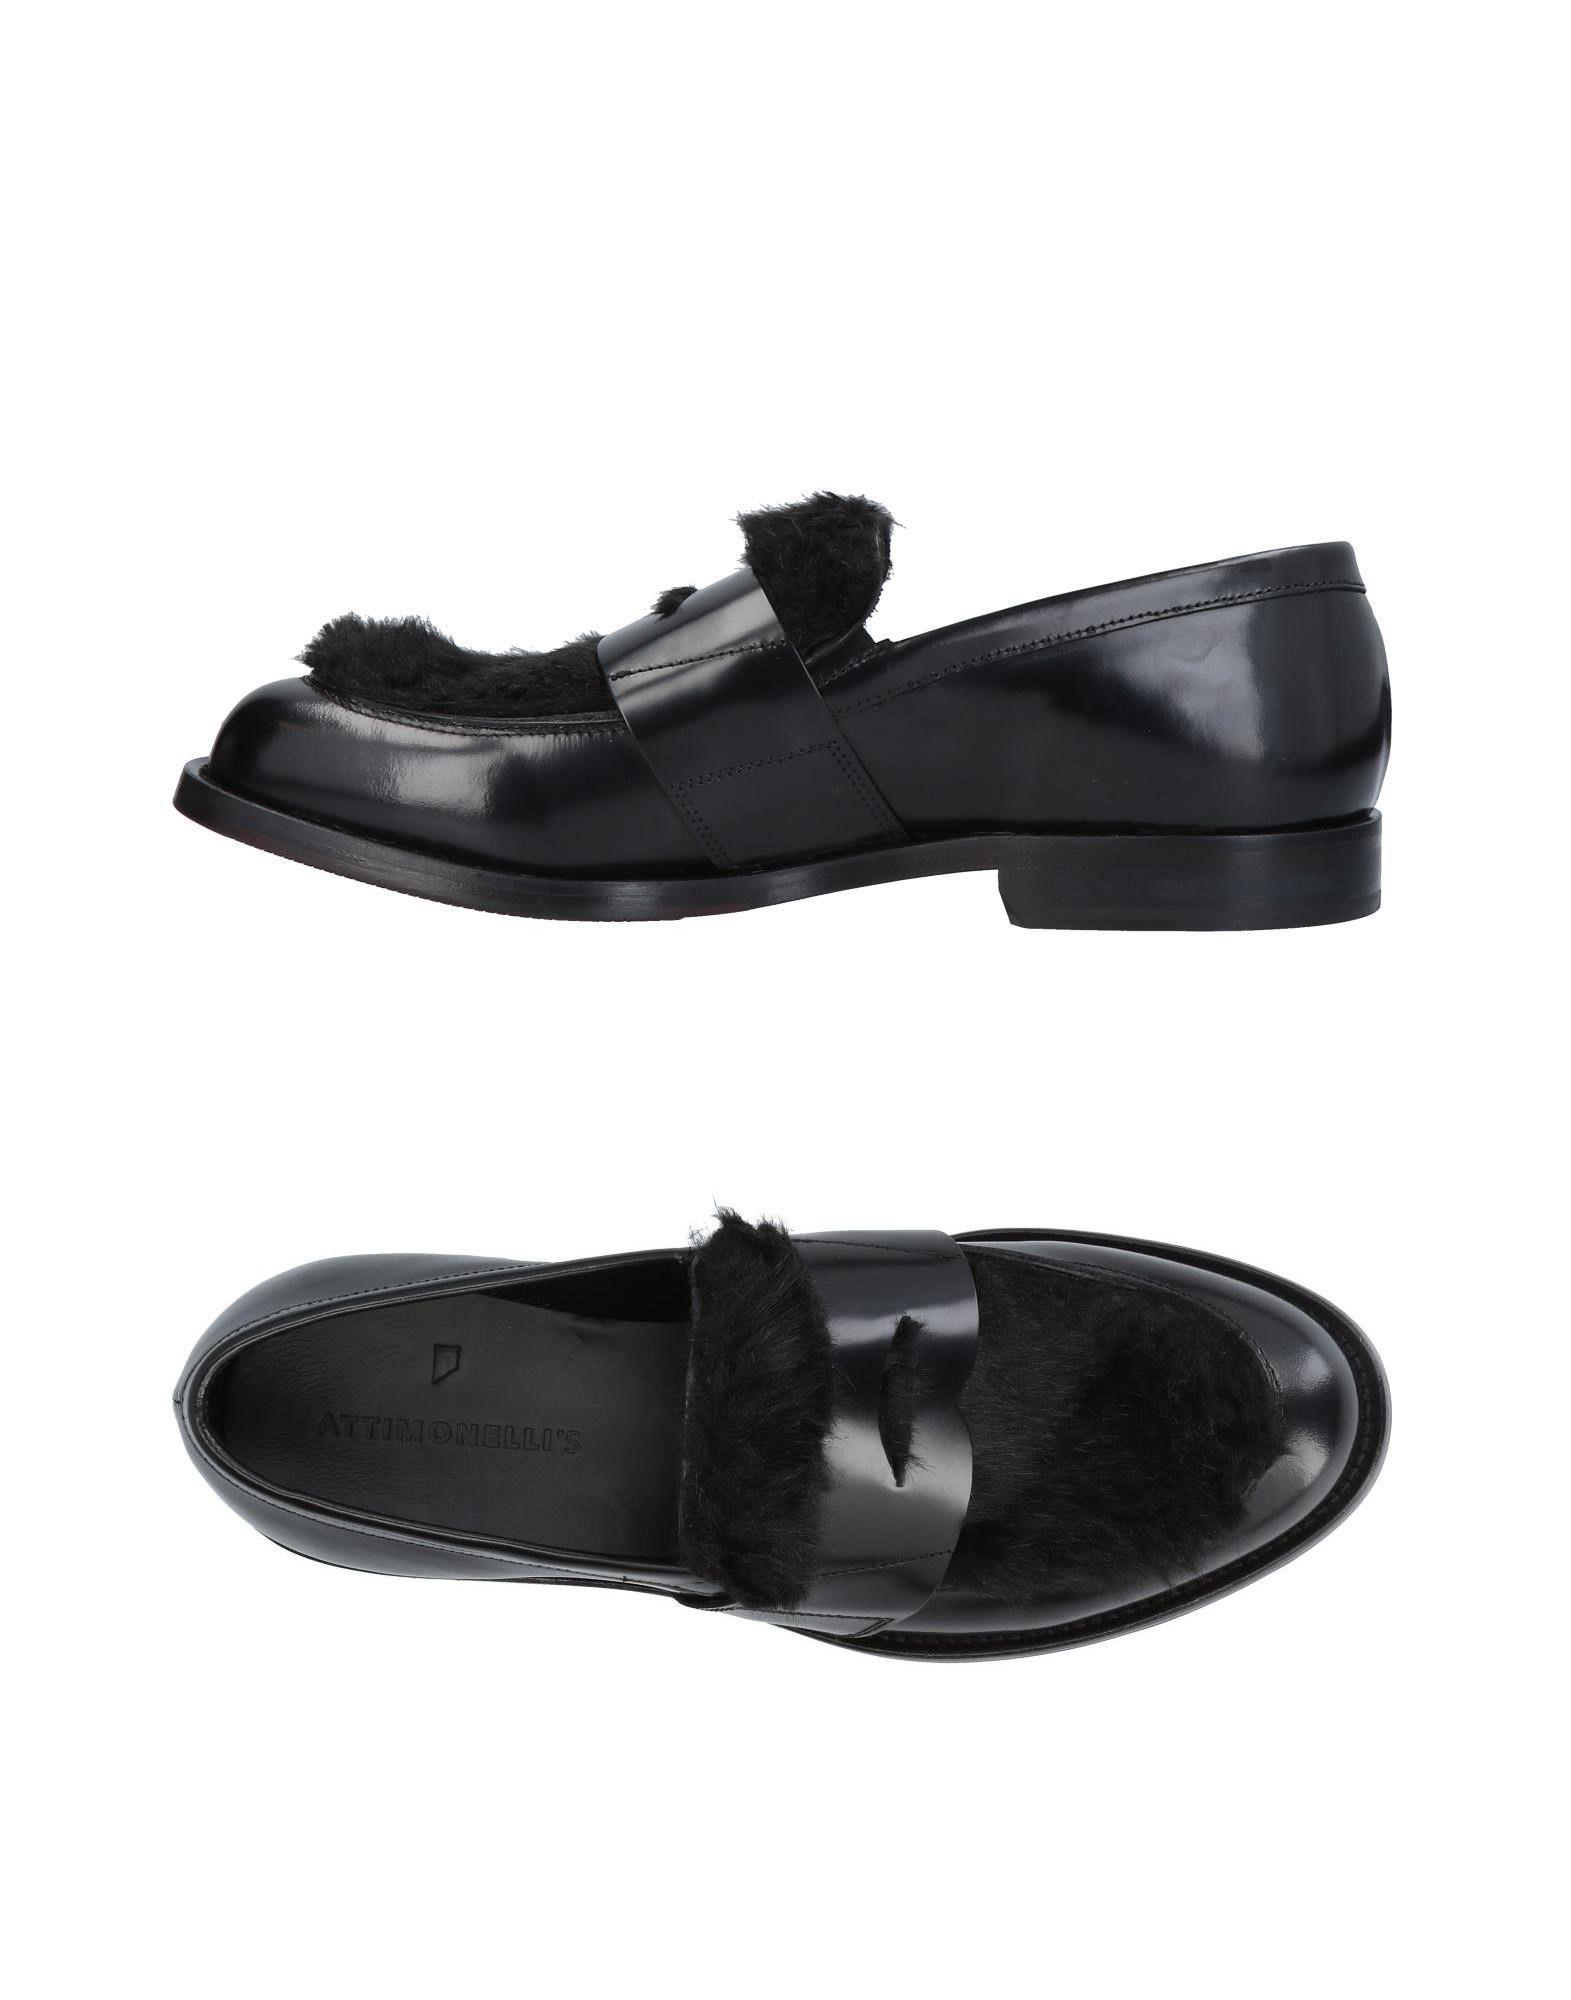 Attimonelli's Mokassins Herren  11448039QV Schuhe Gute Qualität beliebte Schuhe 11448039QV a31f5f